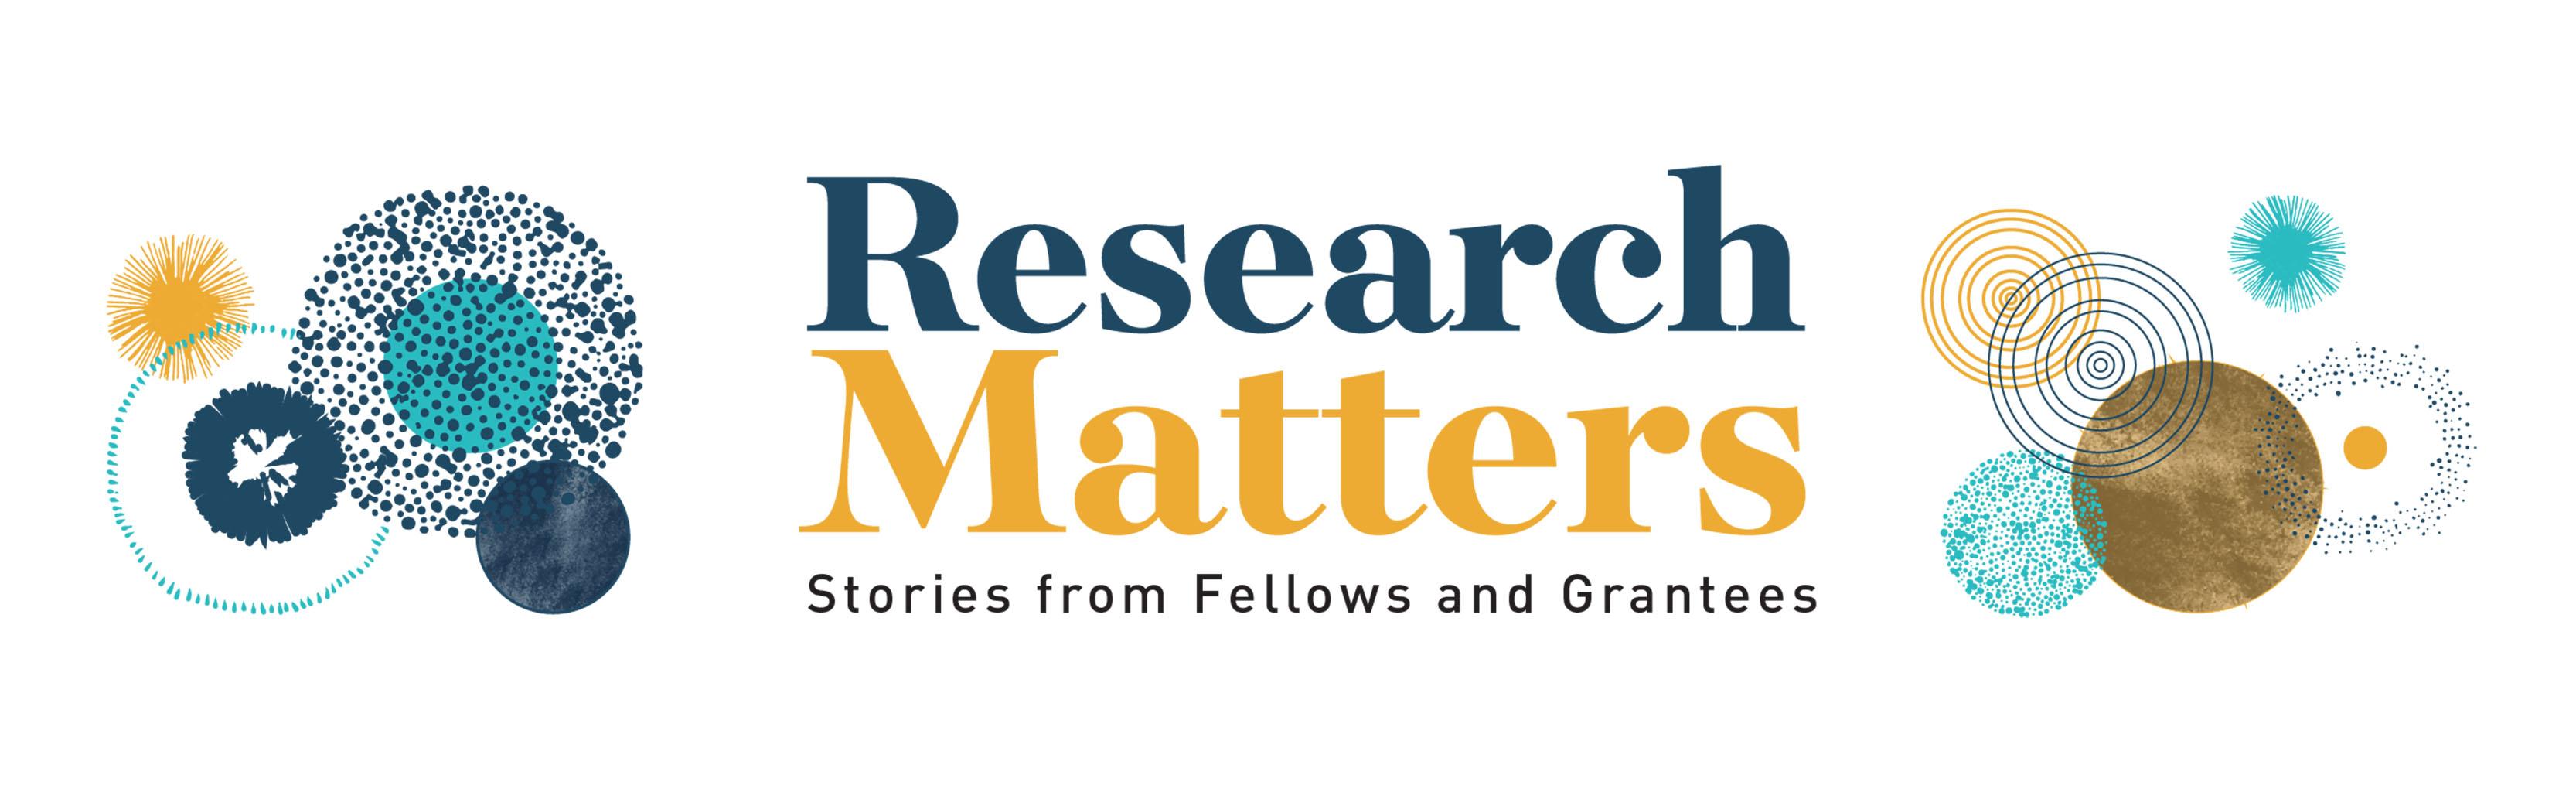 Research Matters logo